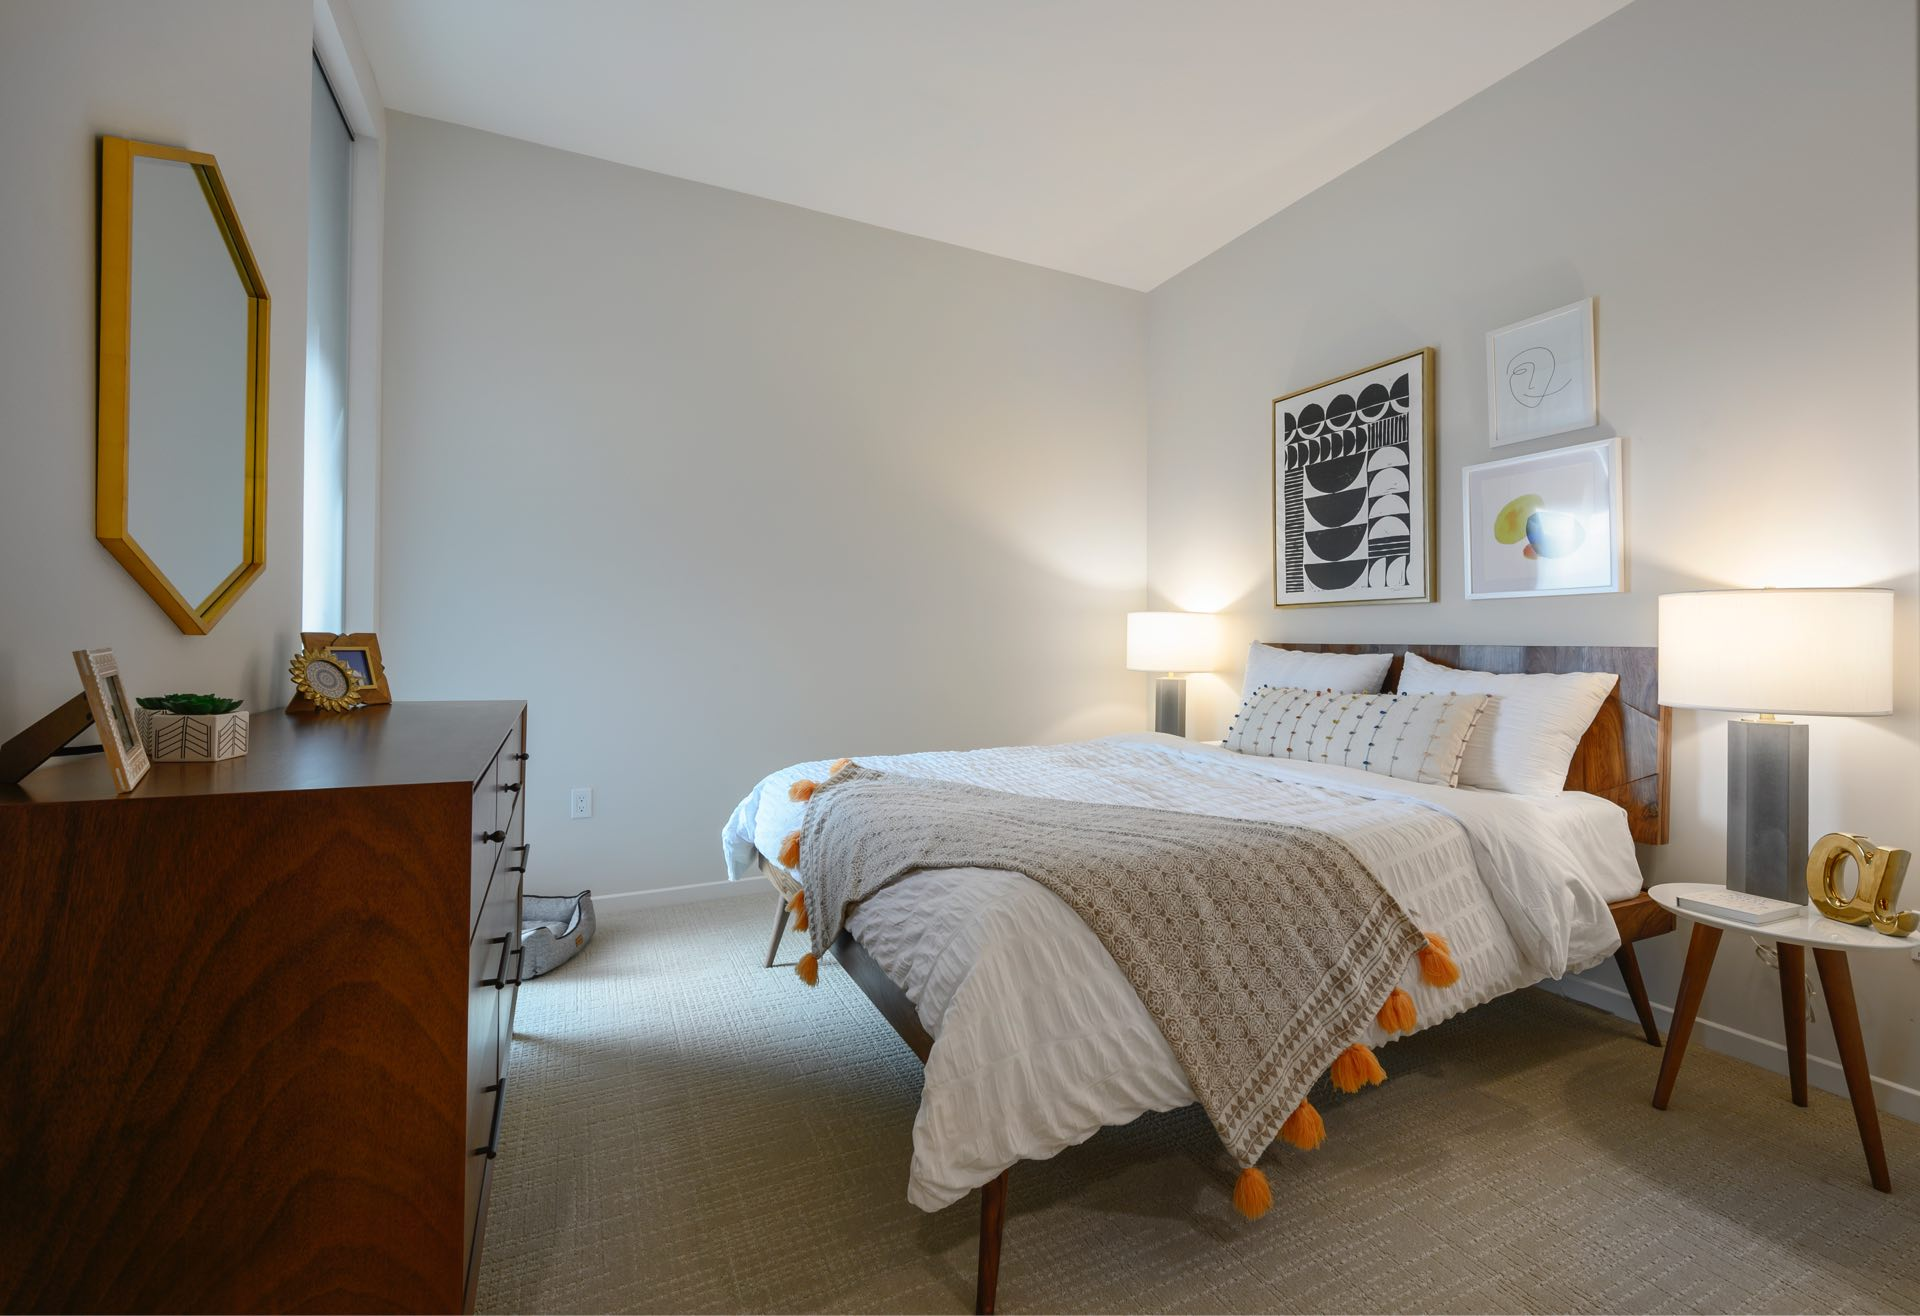 Apartments img 9